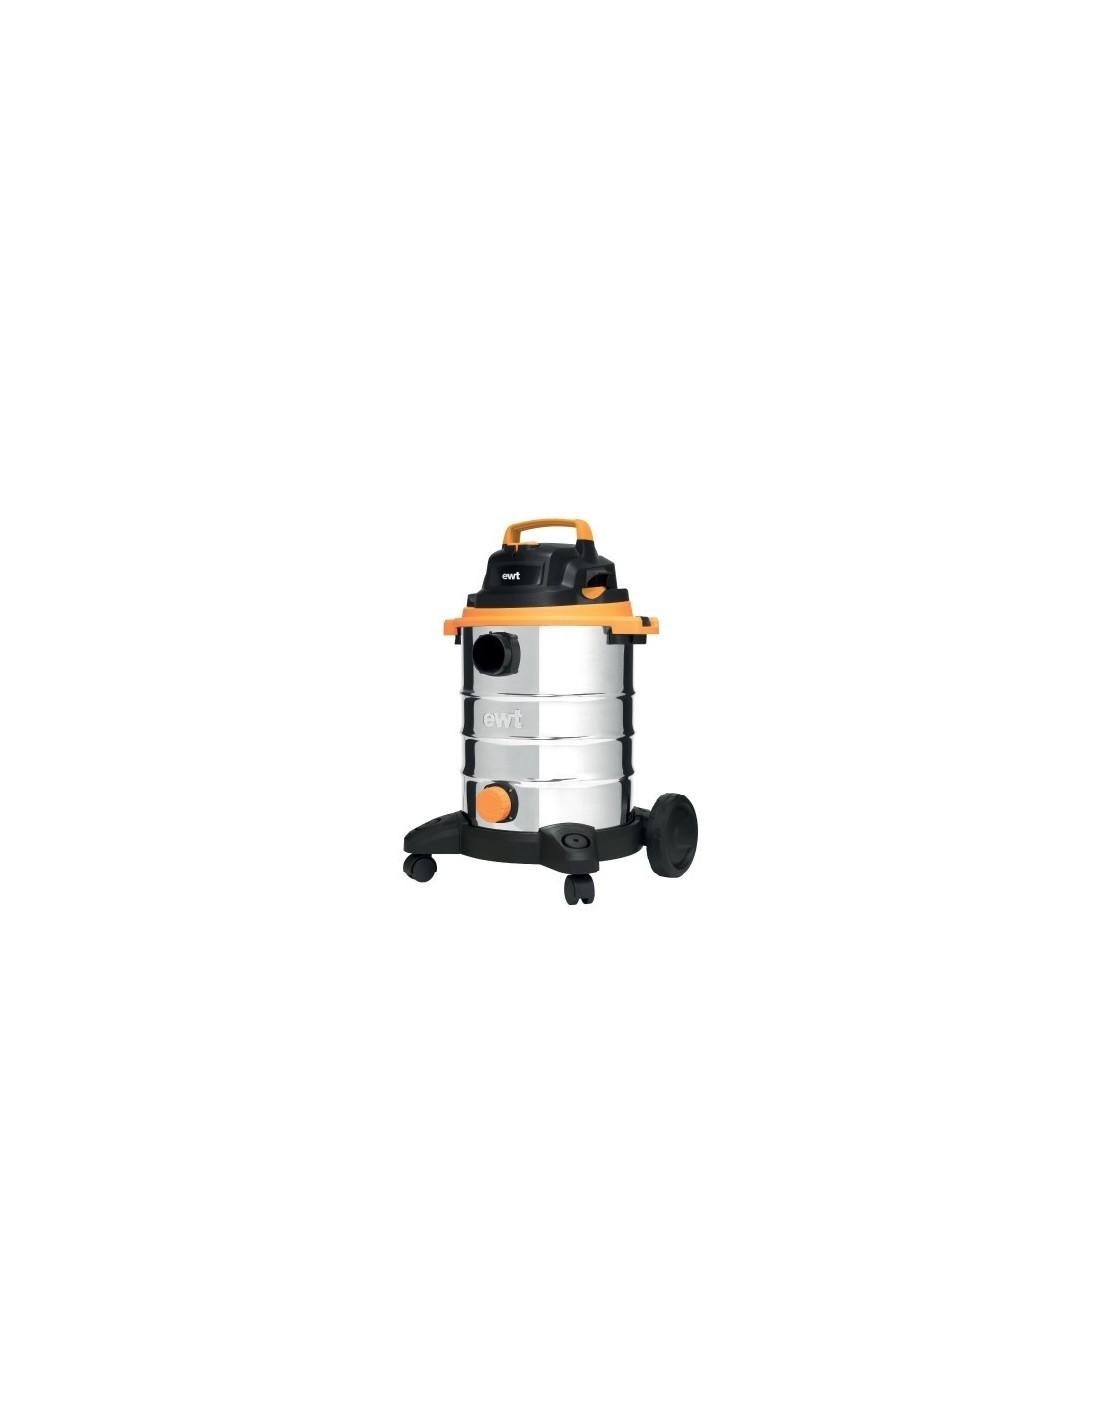 aspirateur eau et poussi res cs 3 comfort bg 900 aspirateur cs3 comfort. Black Bedroom Furniture Sets. Home Design Ideas